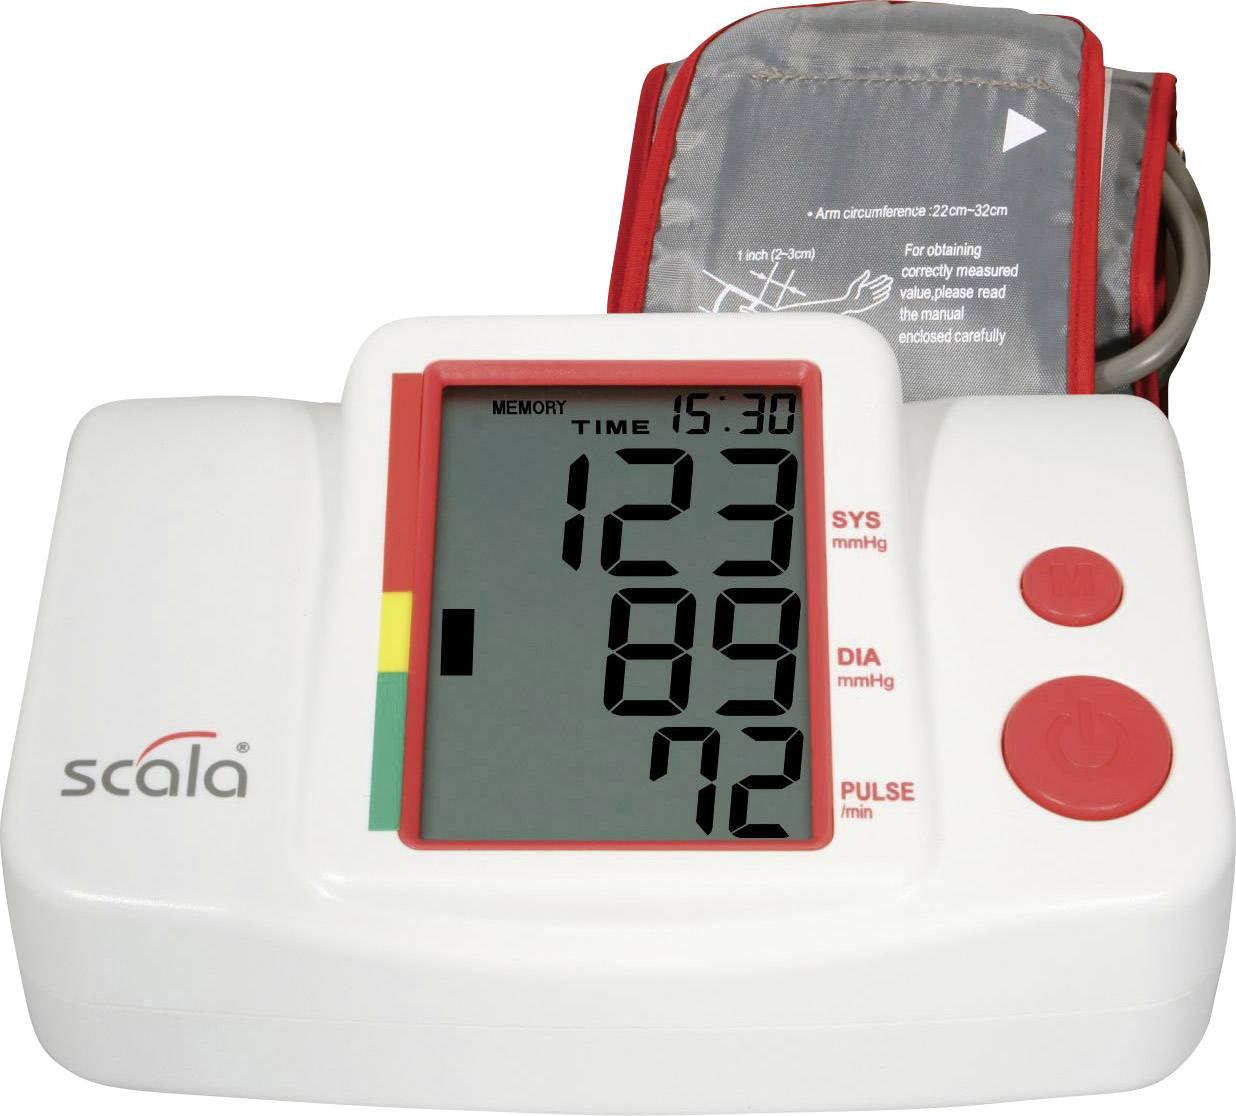 Oberarm Blutdruckmessgerät Scala SC6800 02479